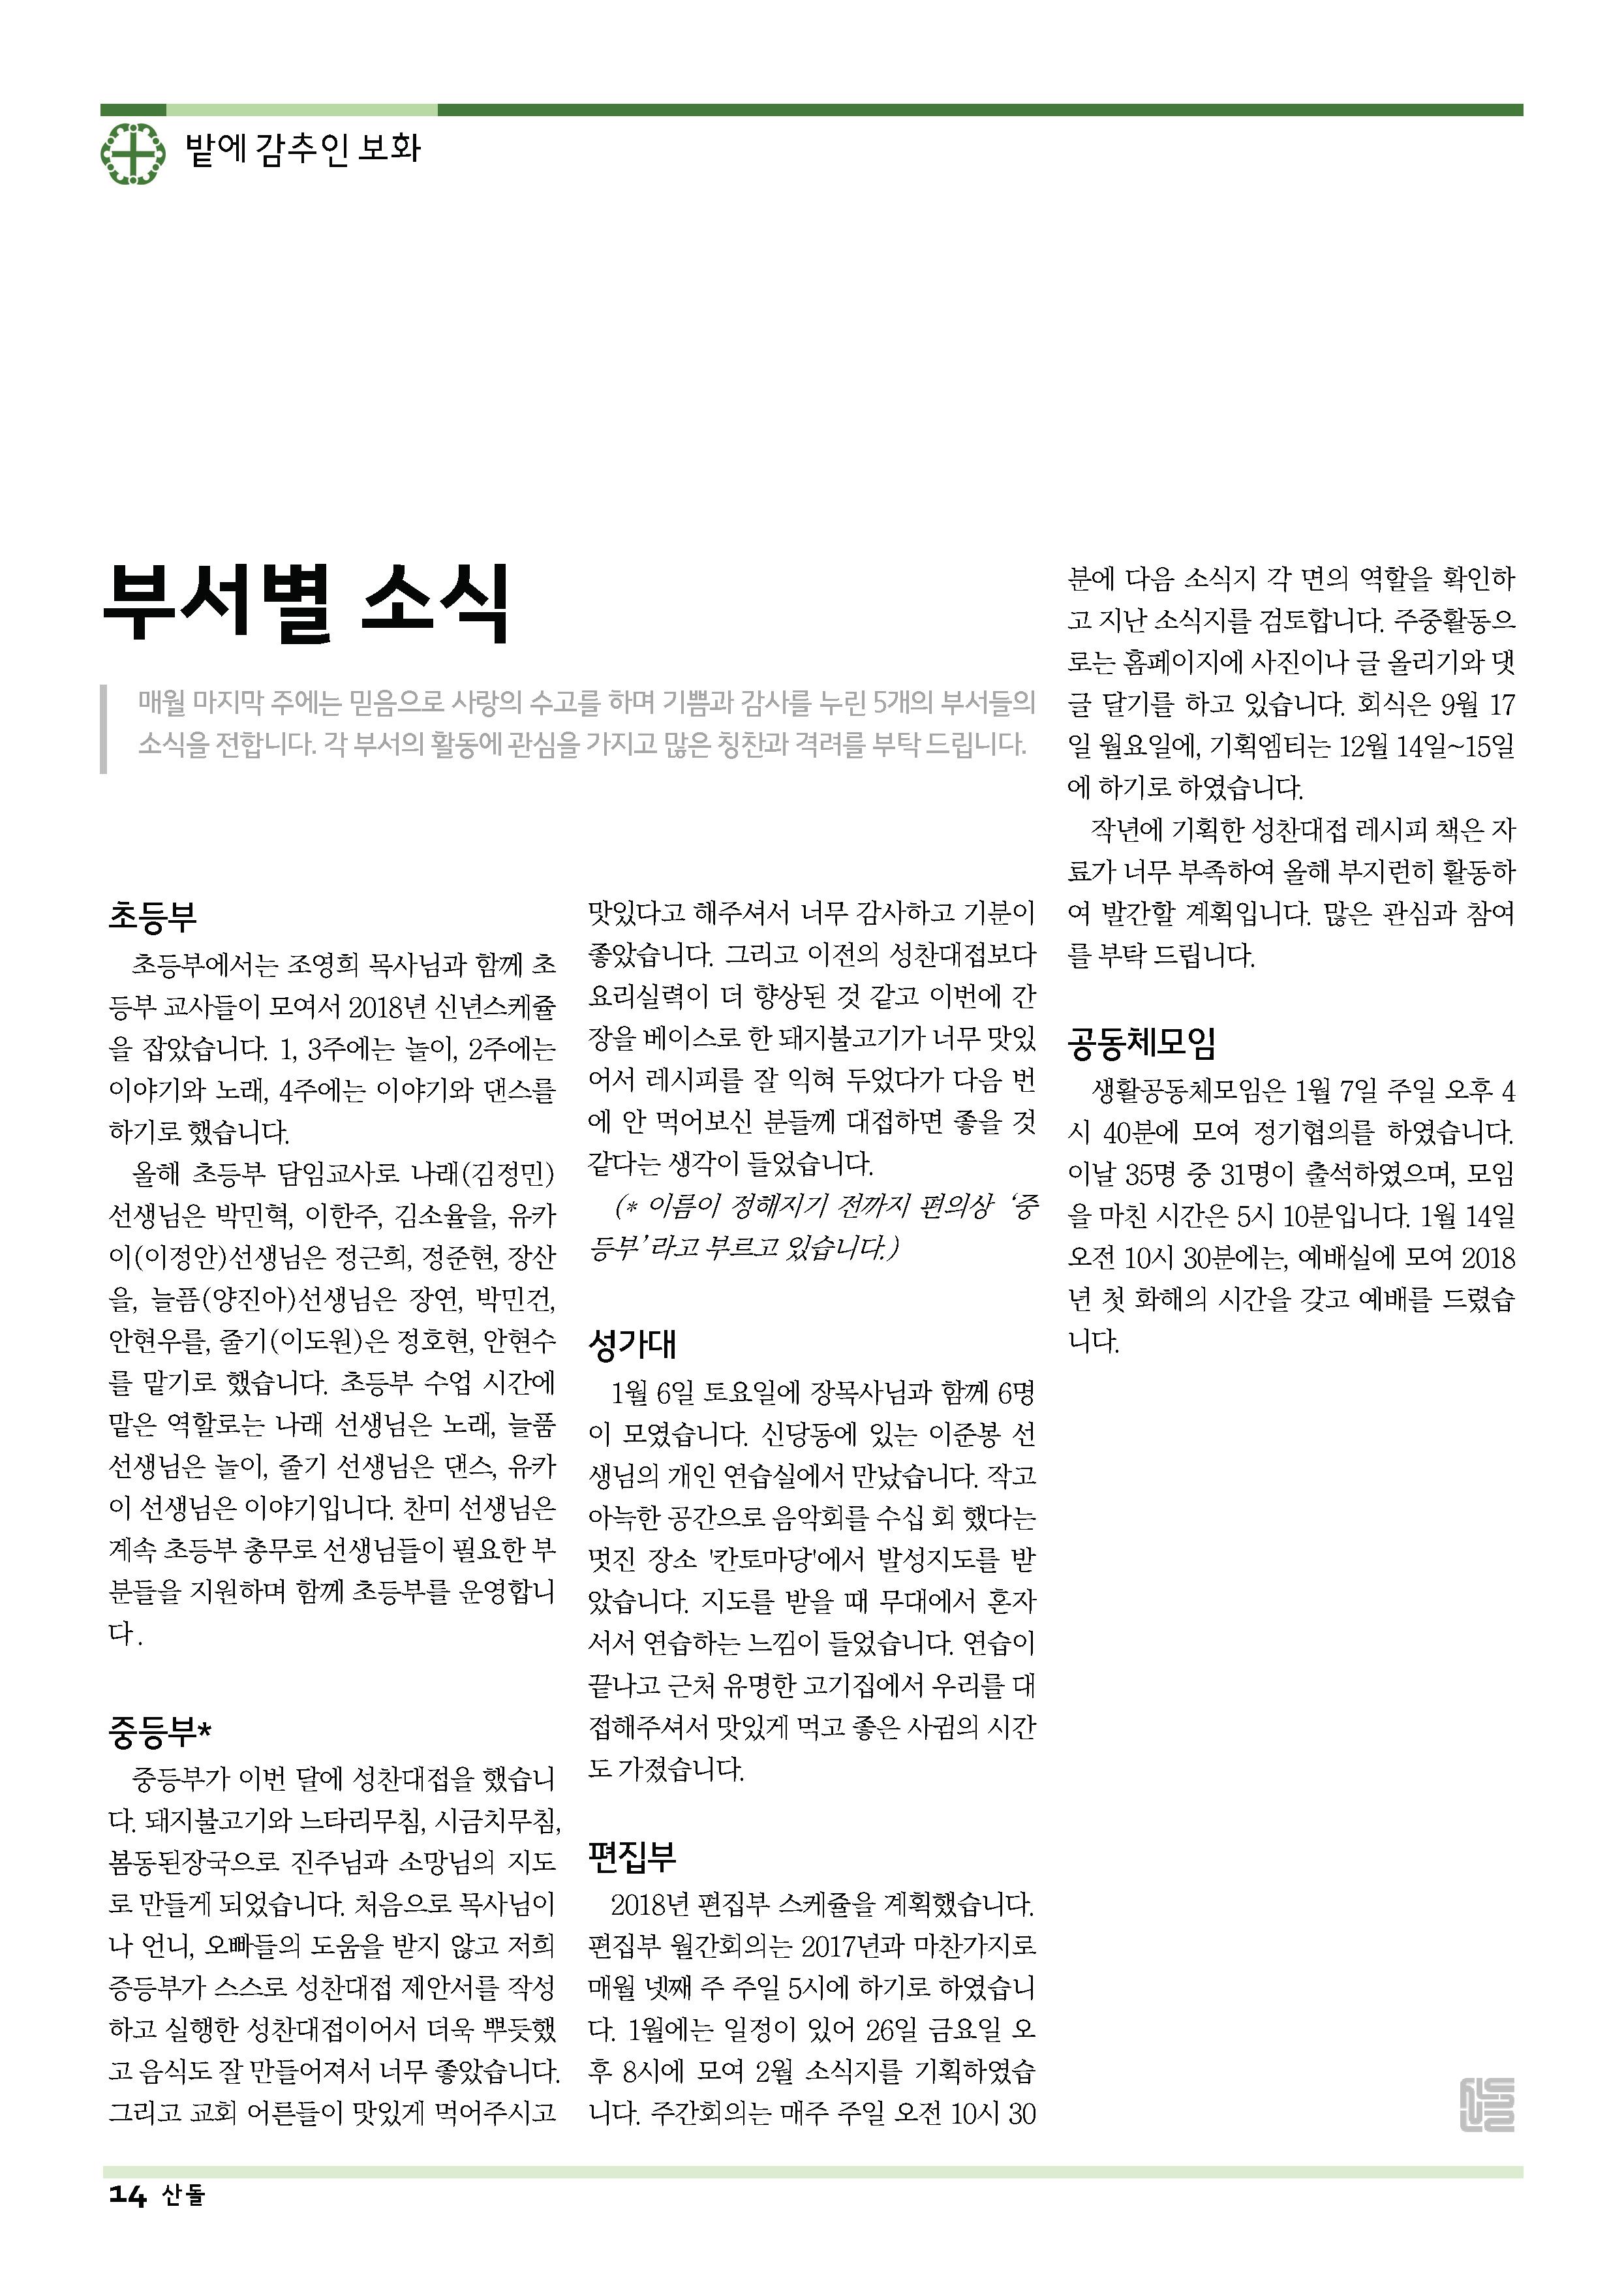 18sdjb0128_페이지_14.png